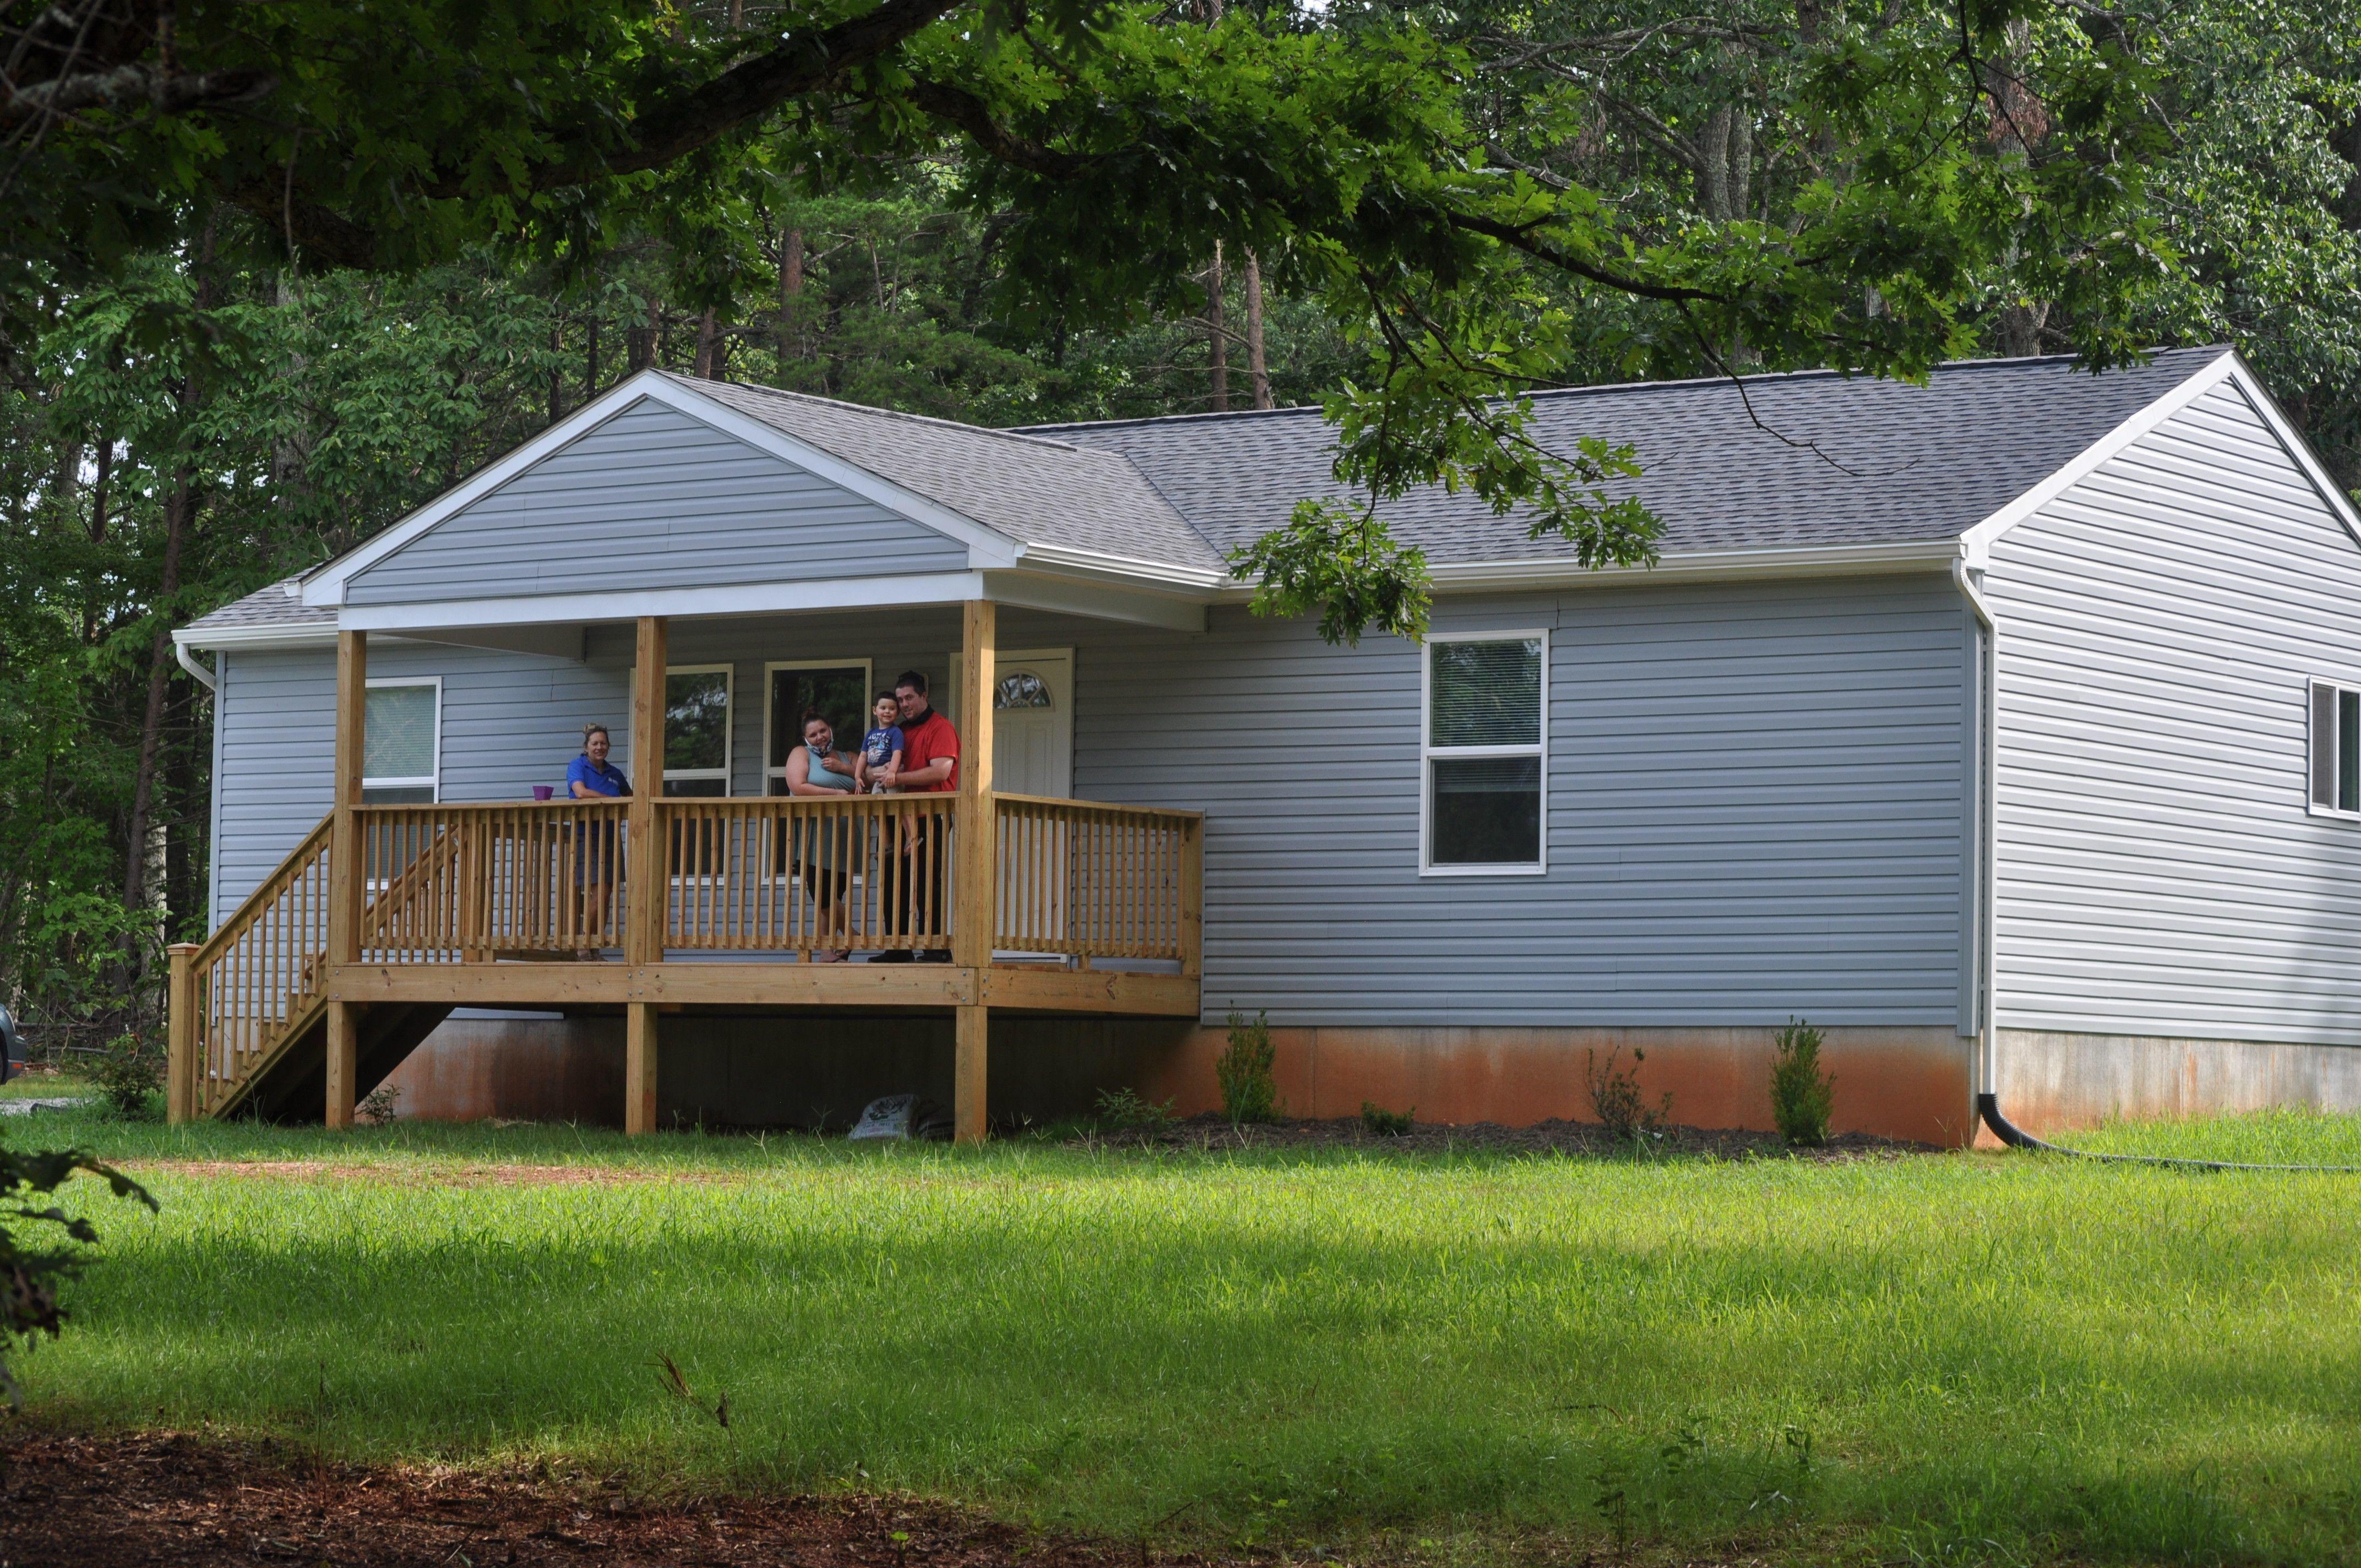 Erin Swinson's home.